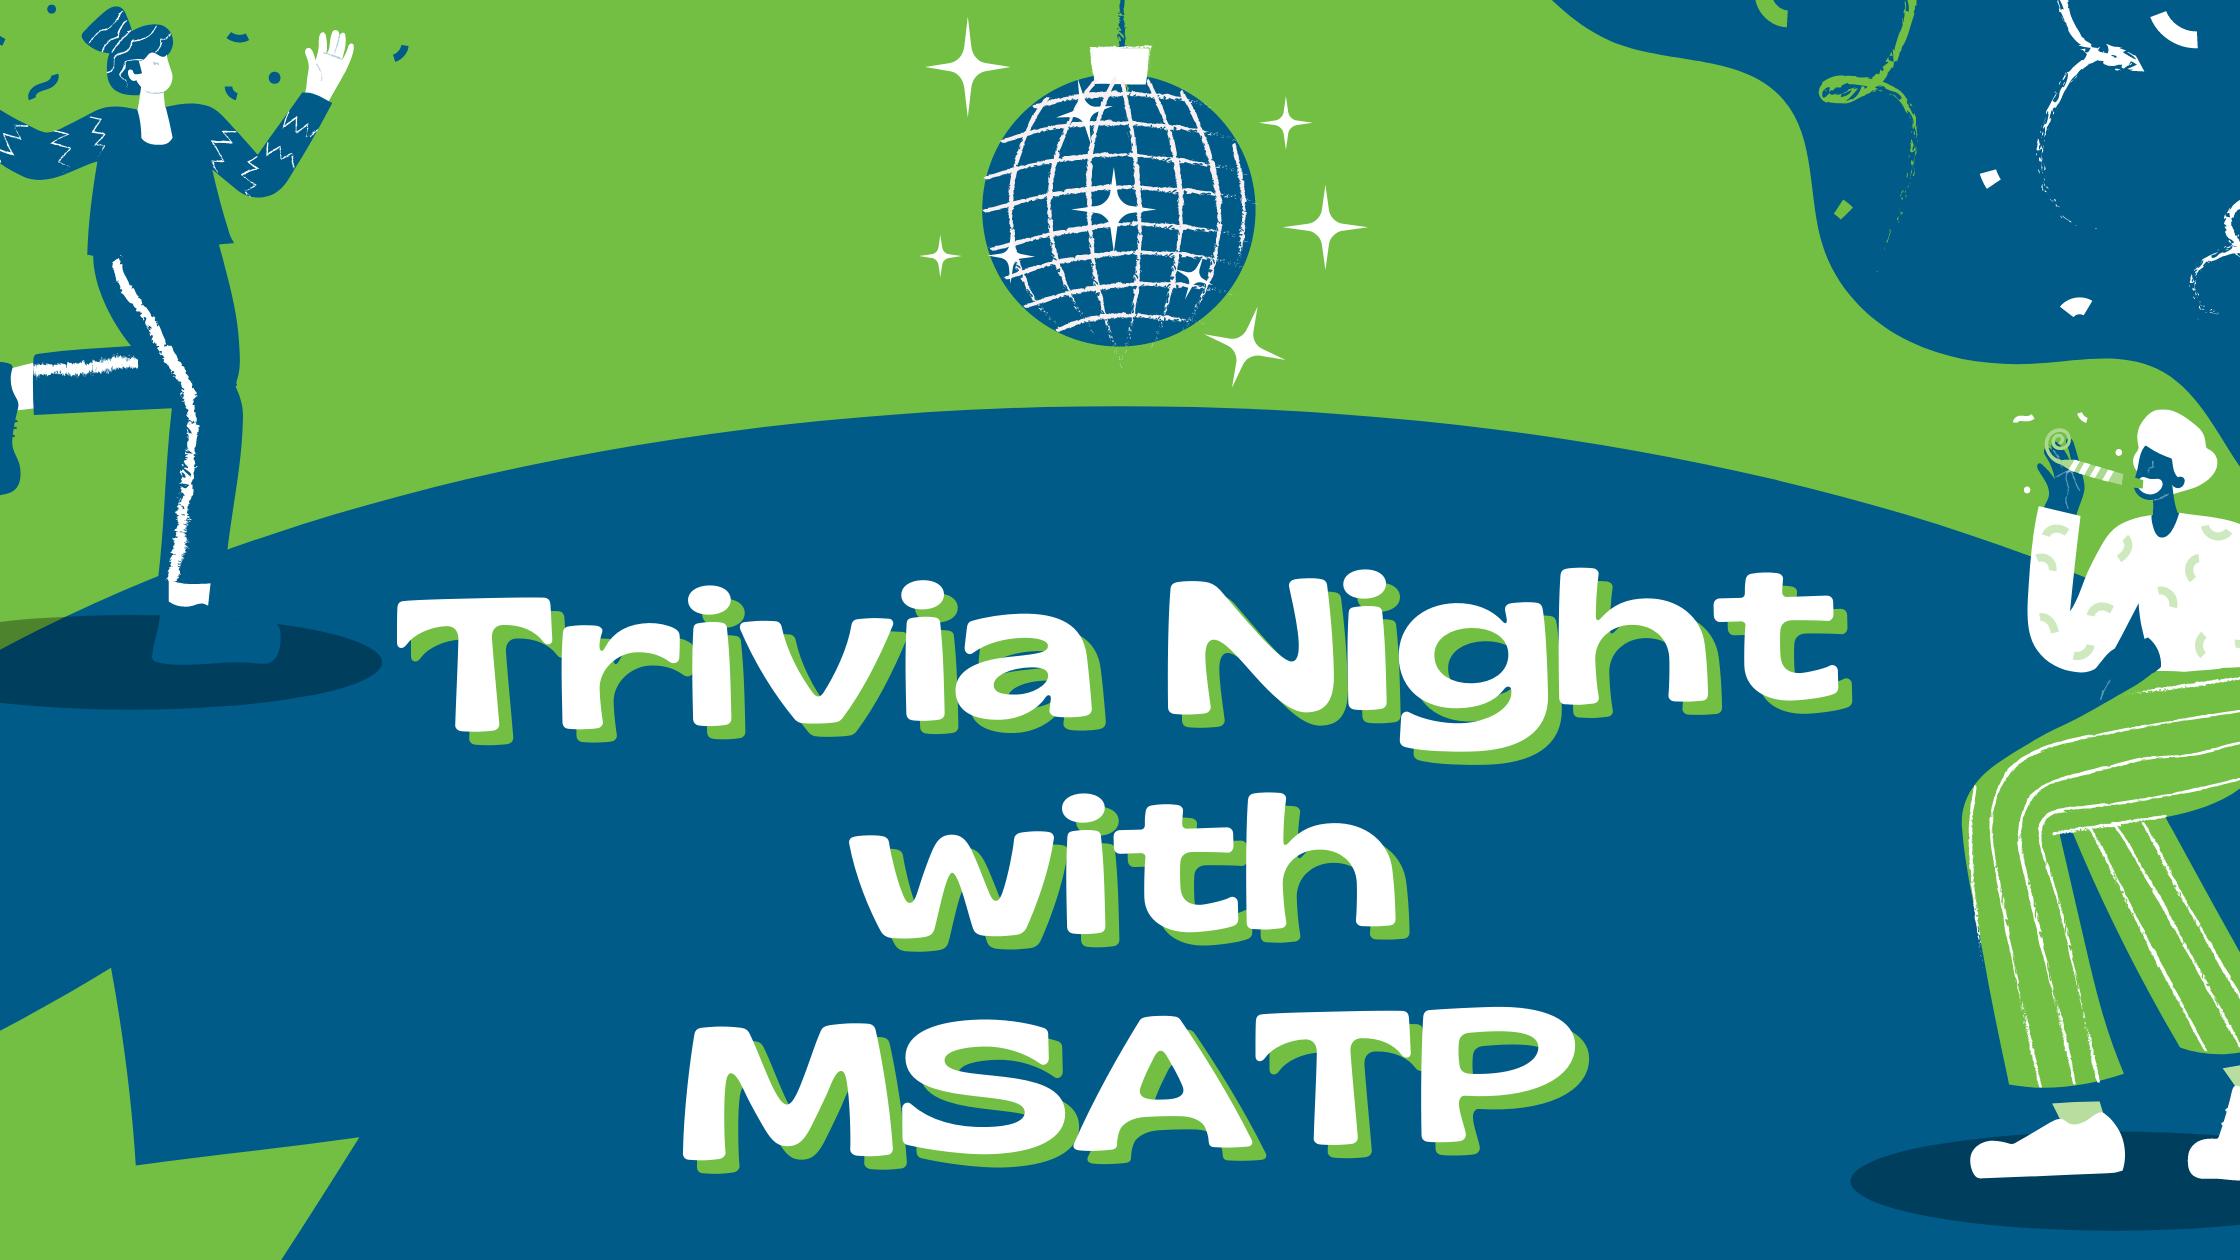 Trivia Night with MSATP